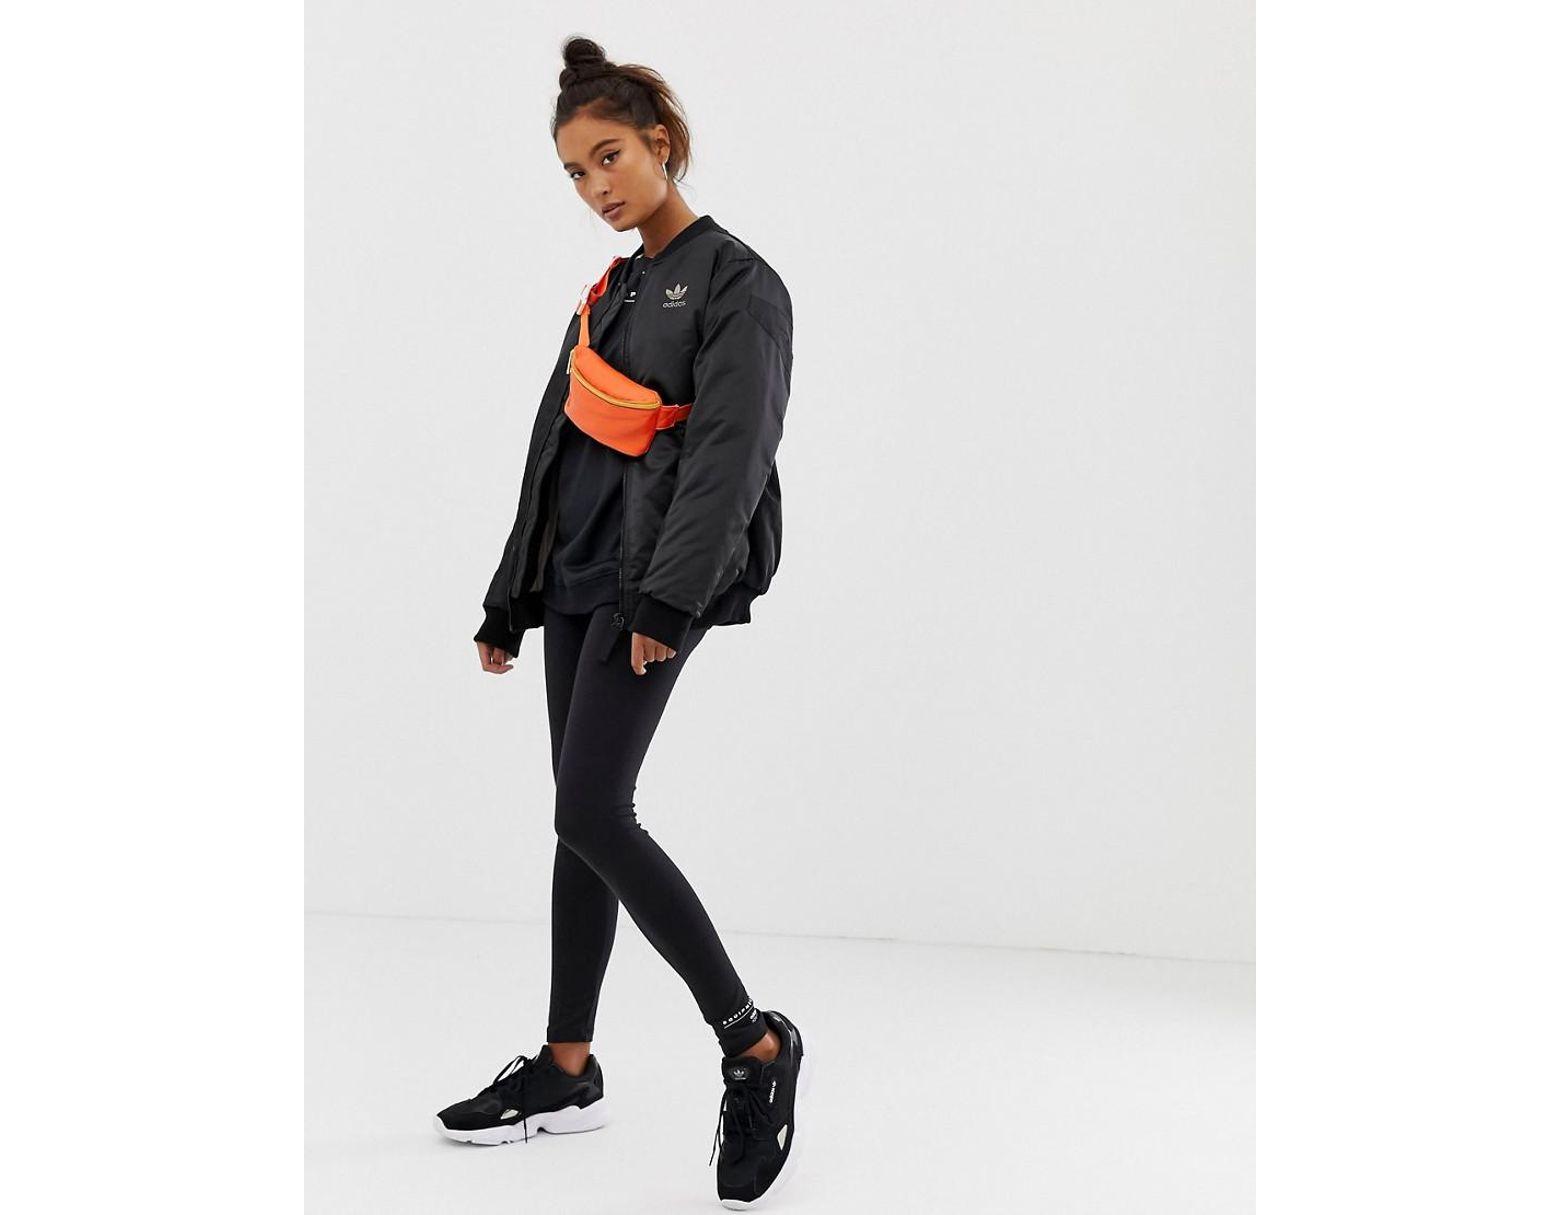 9d33e09a6eeff adidas Originals Eqt Tight leggings In Black in Black - Lyst